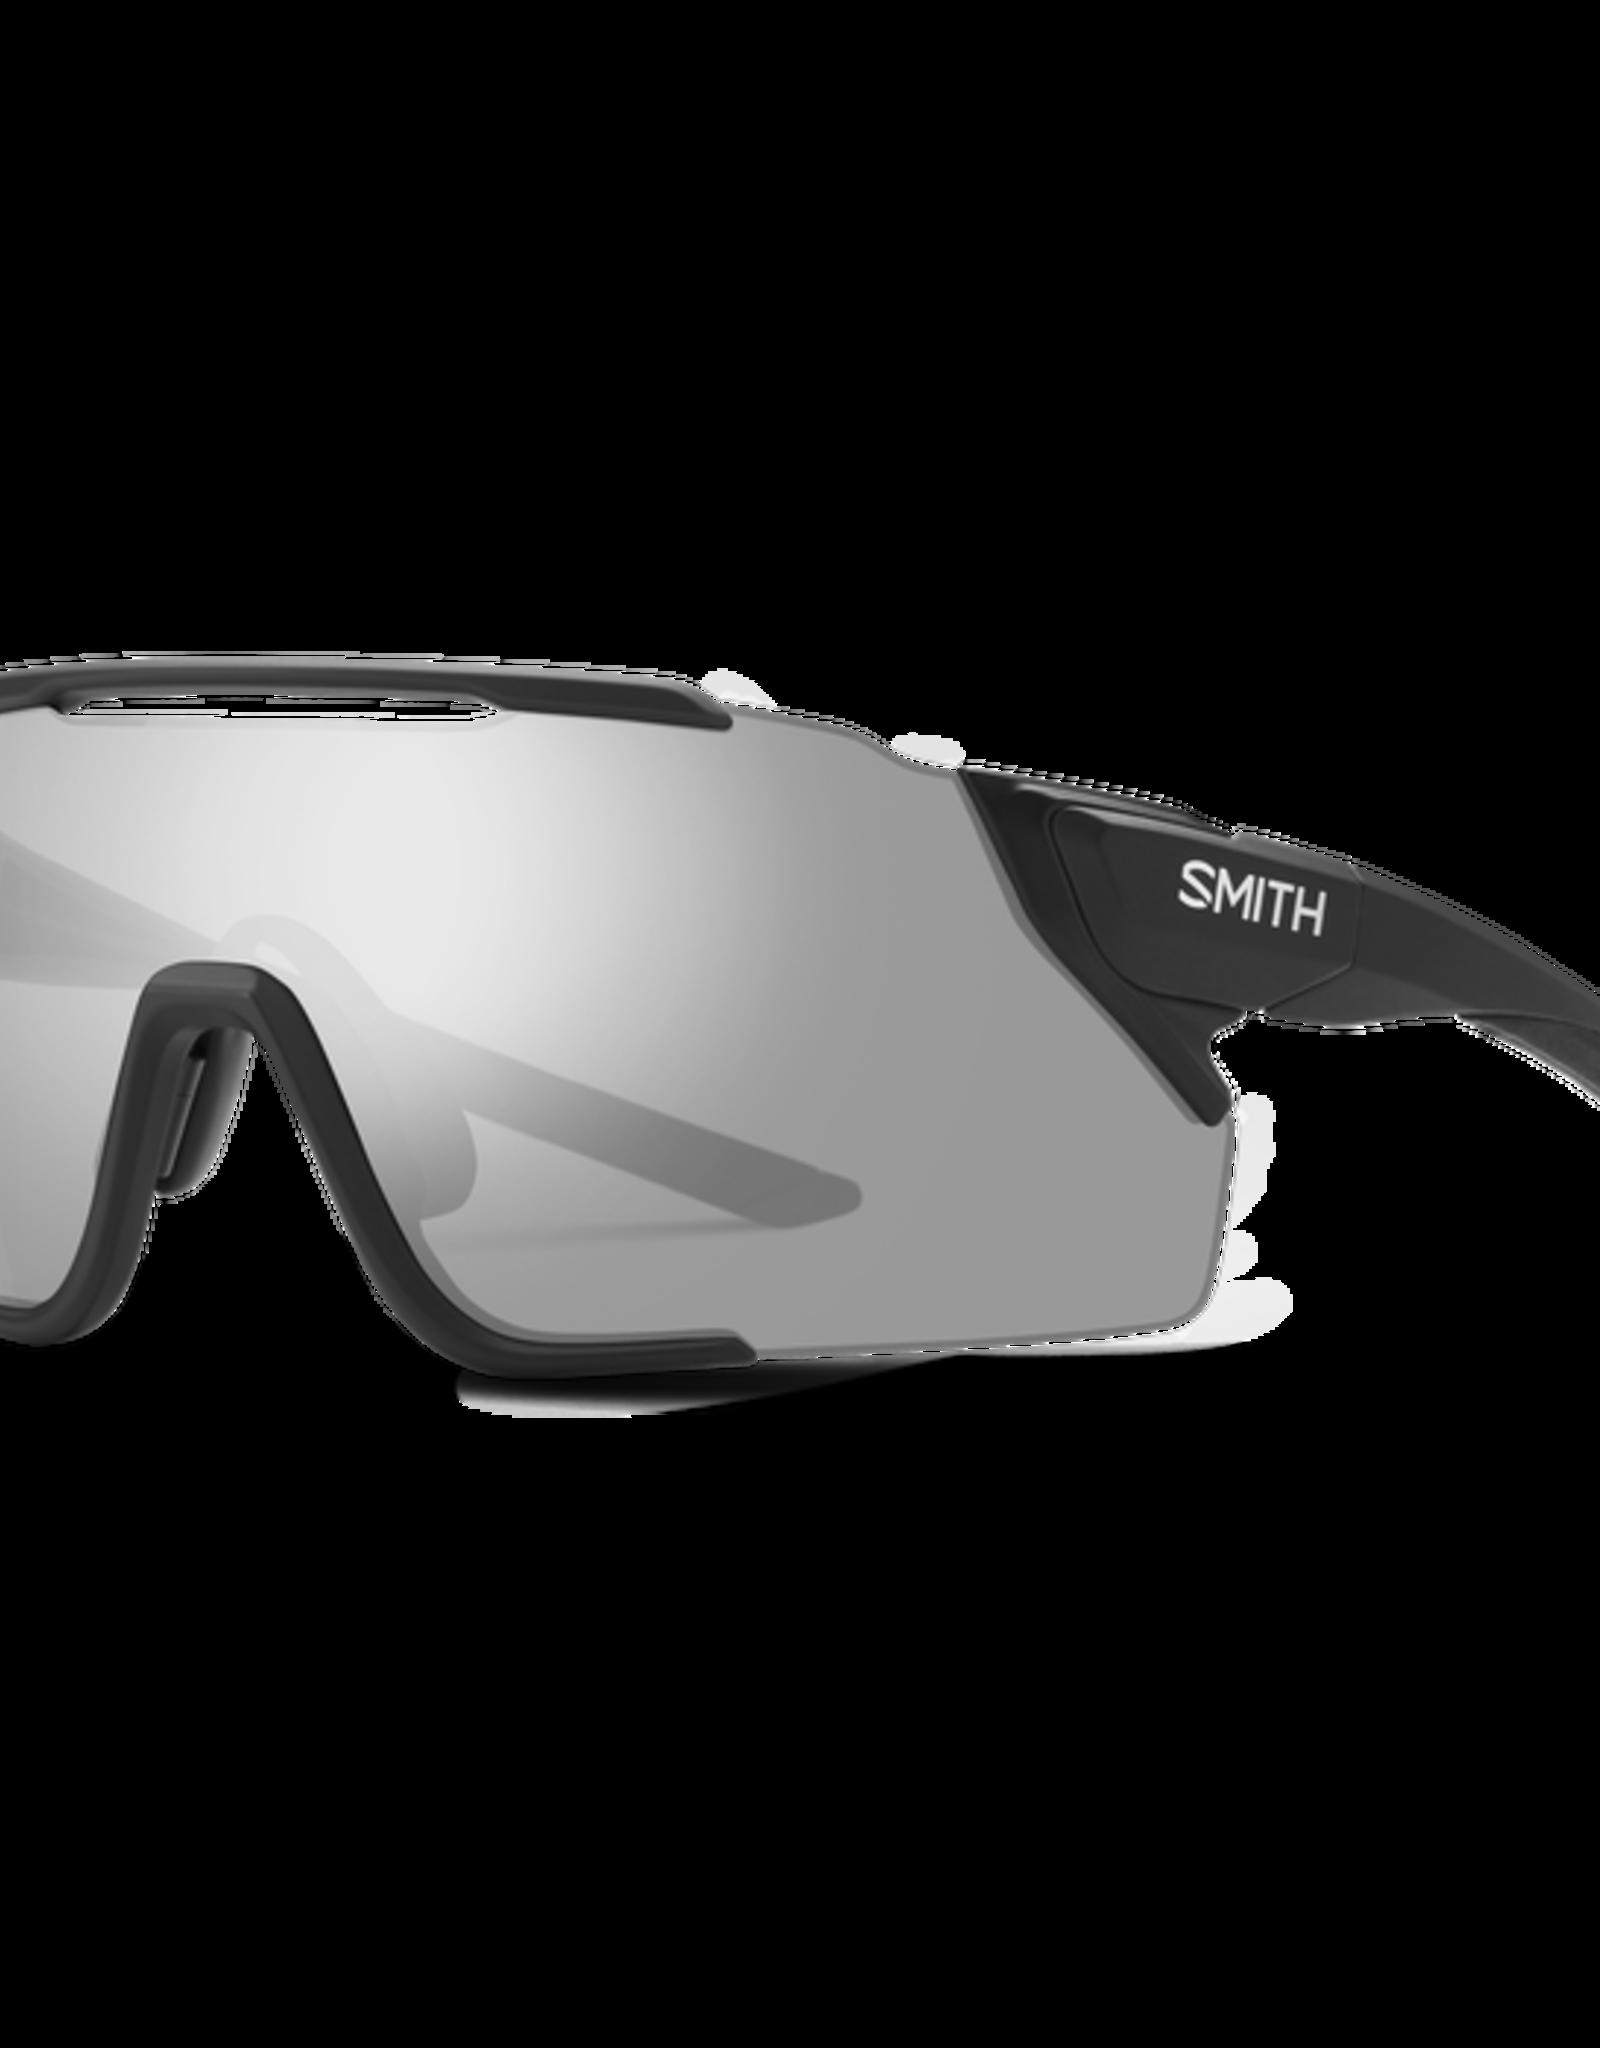 SMITH OPTICS SMITH Sunglasses ATTACK MAG MTB  Matte Black ChromaPop Platinum/ChromaPop Low Light Amber